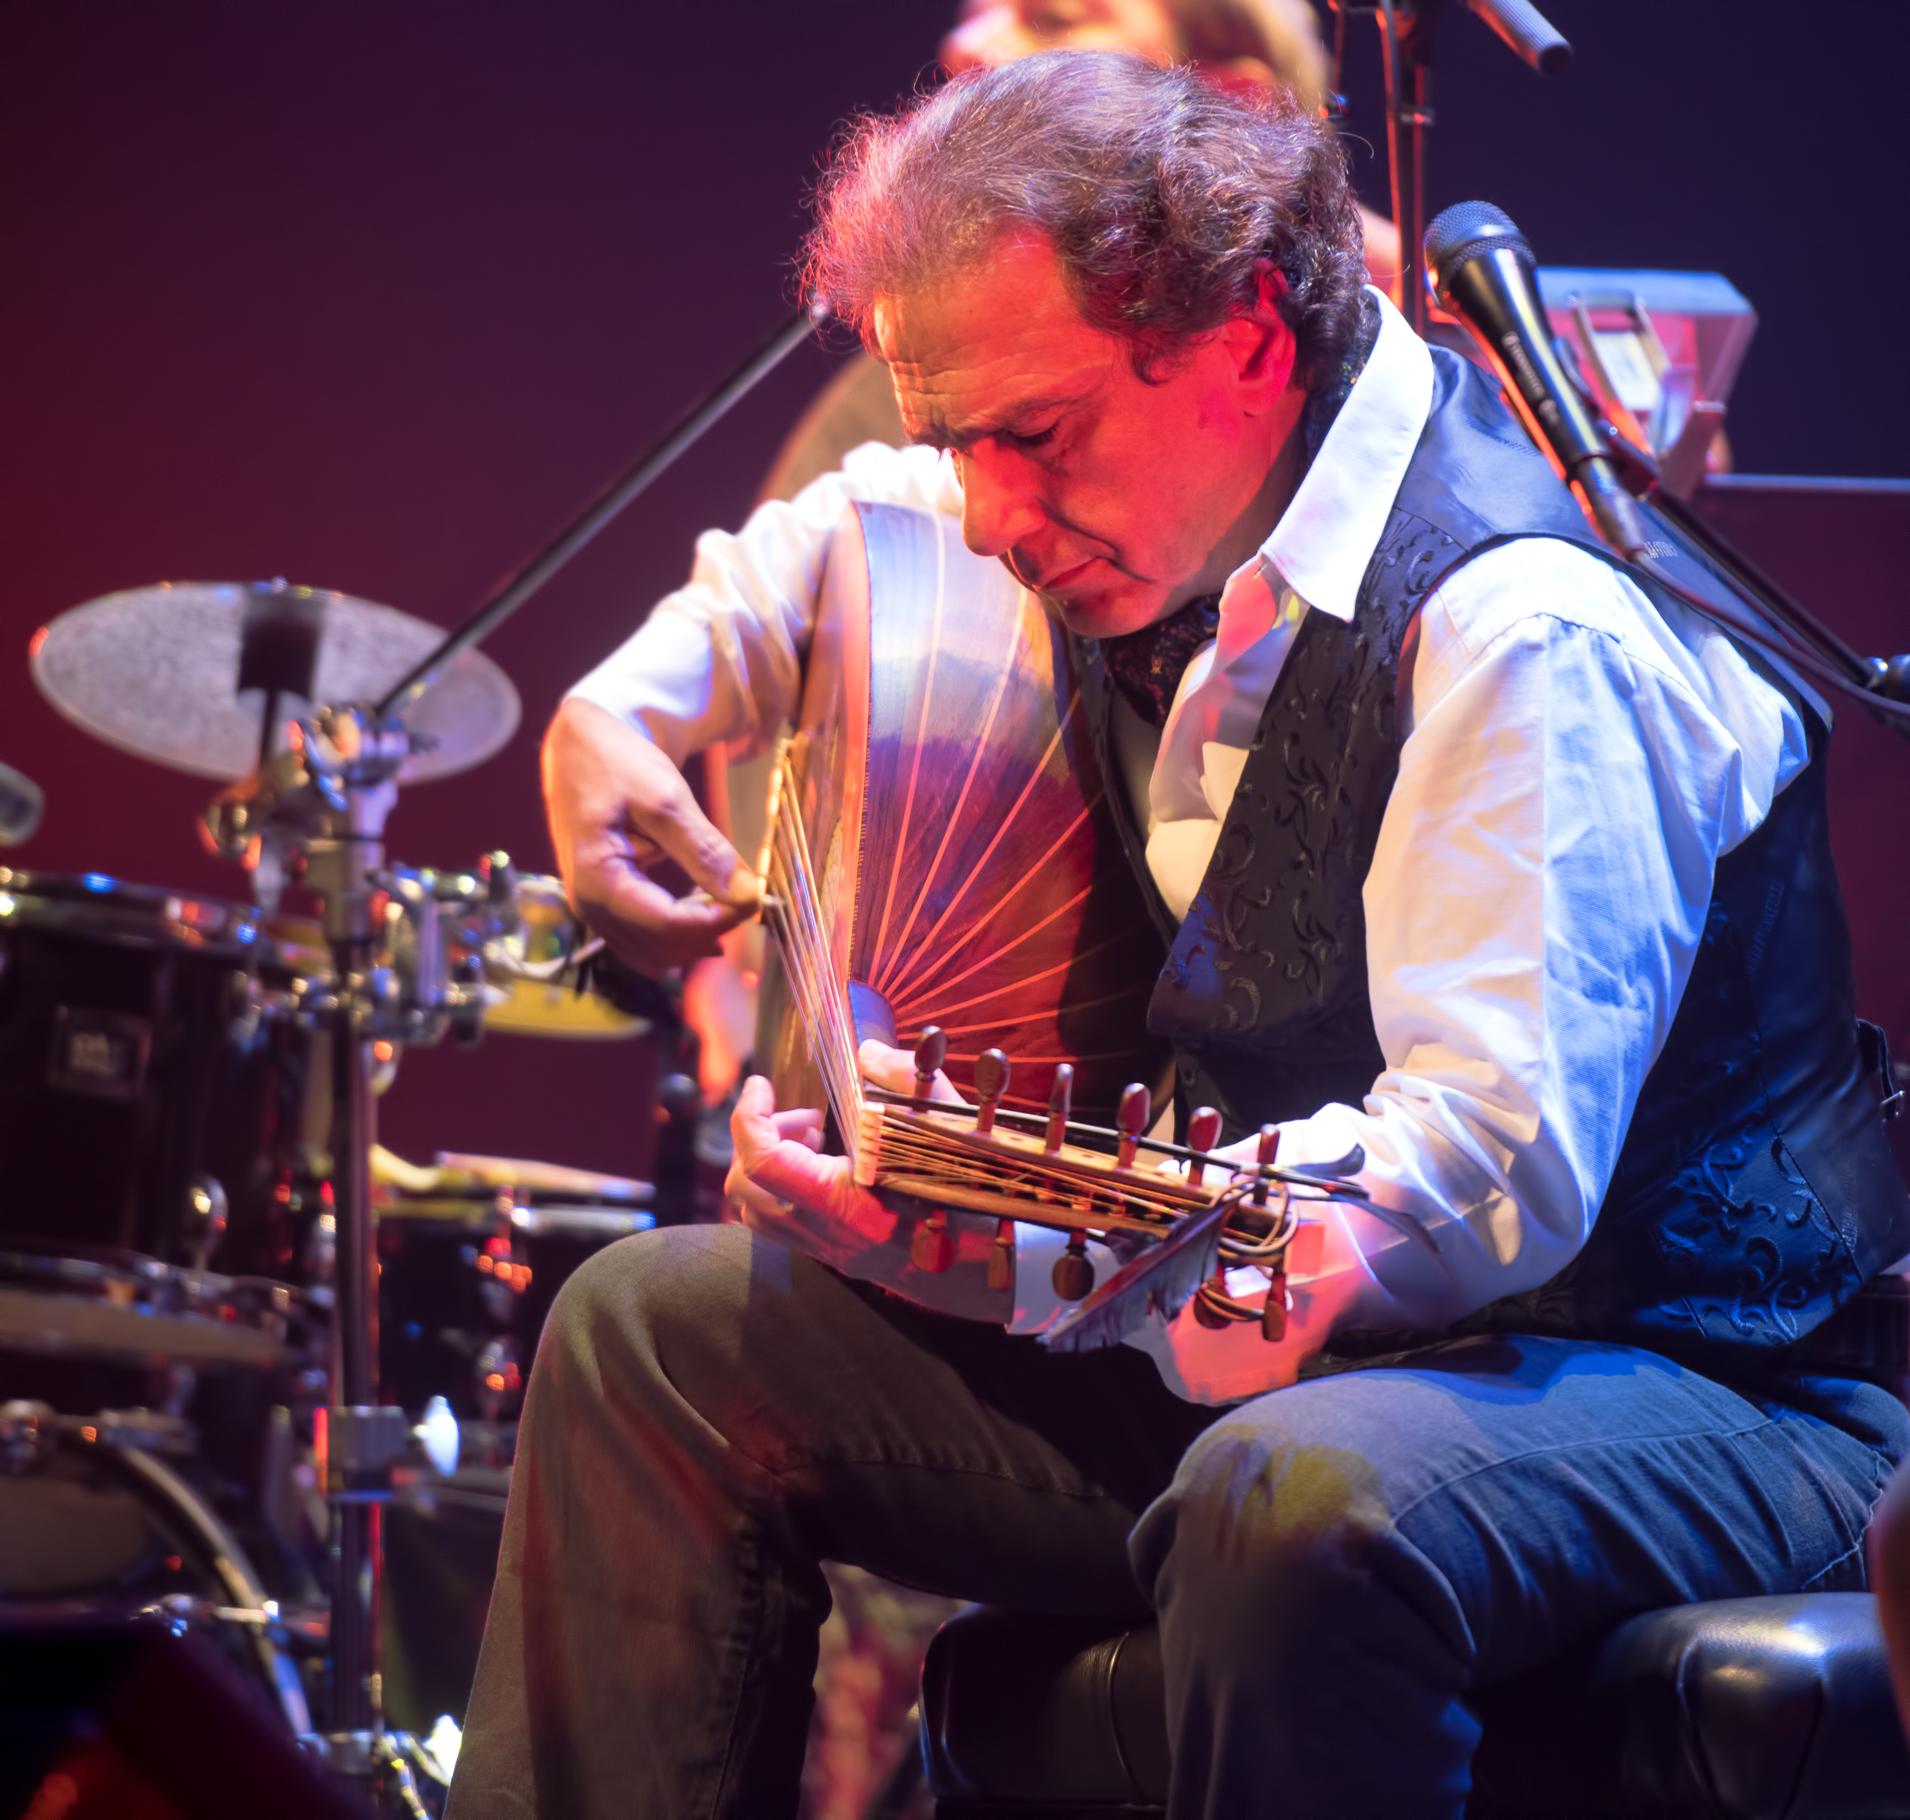 Rabih Abou-Khalil at the Montreal International Jazz Festival 2015